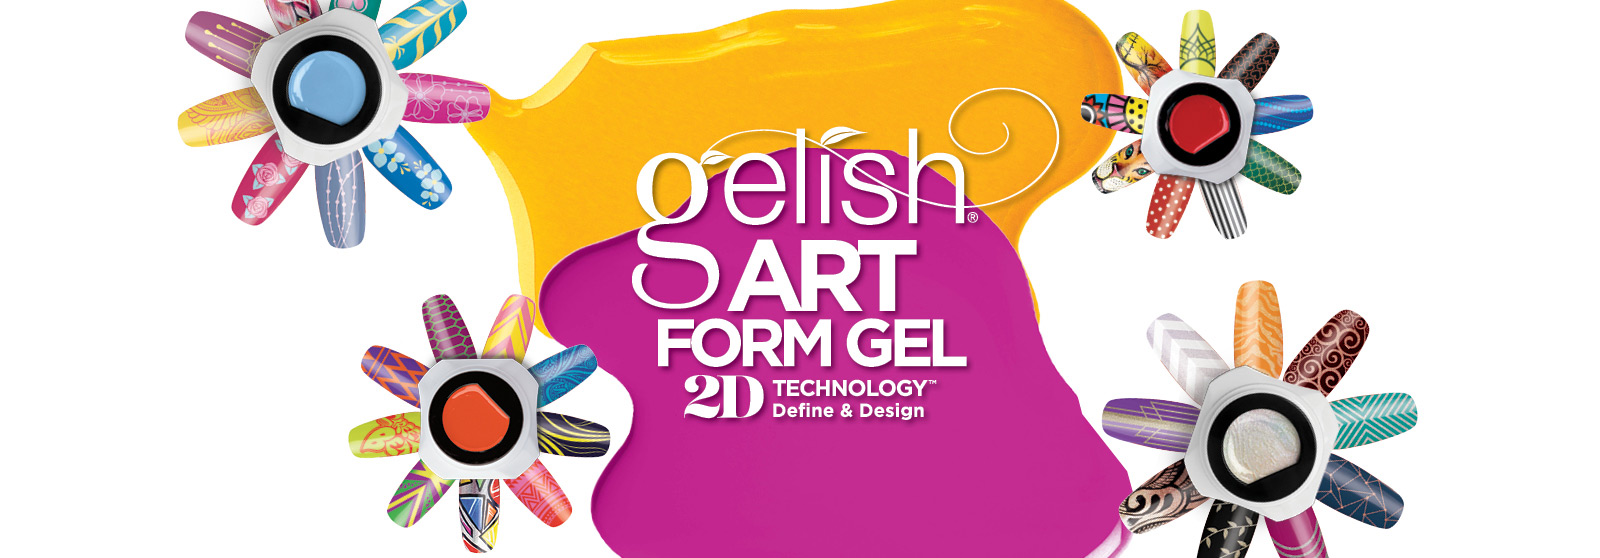 Gelish Art Form Gel - One Stroke True Color